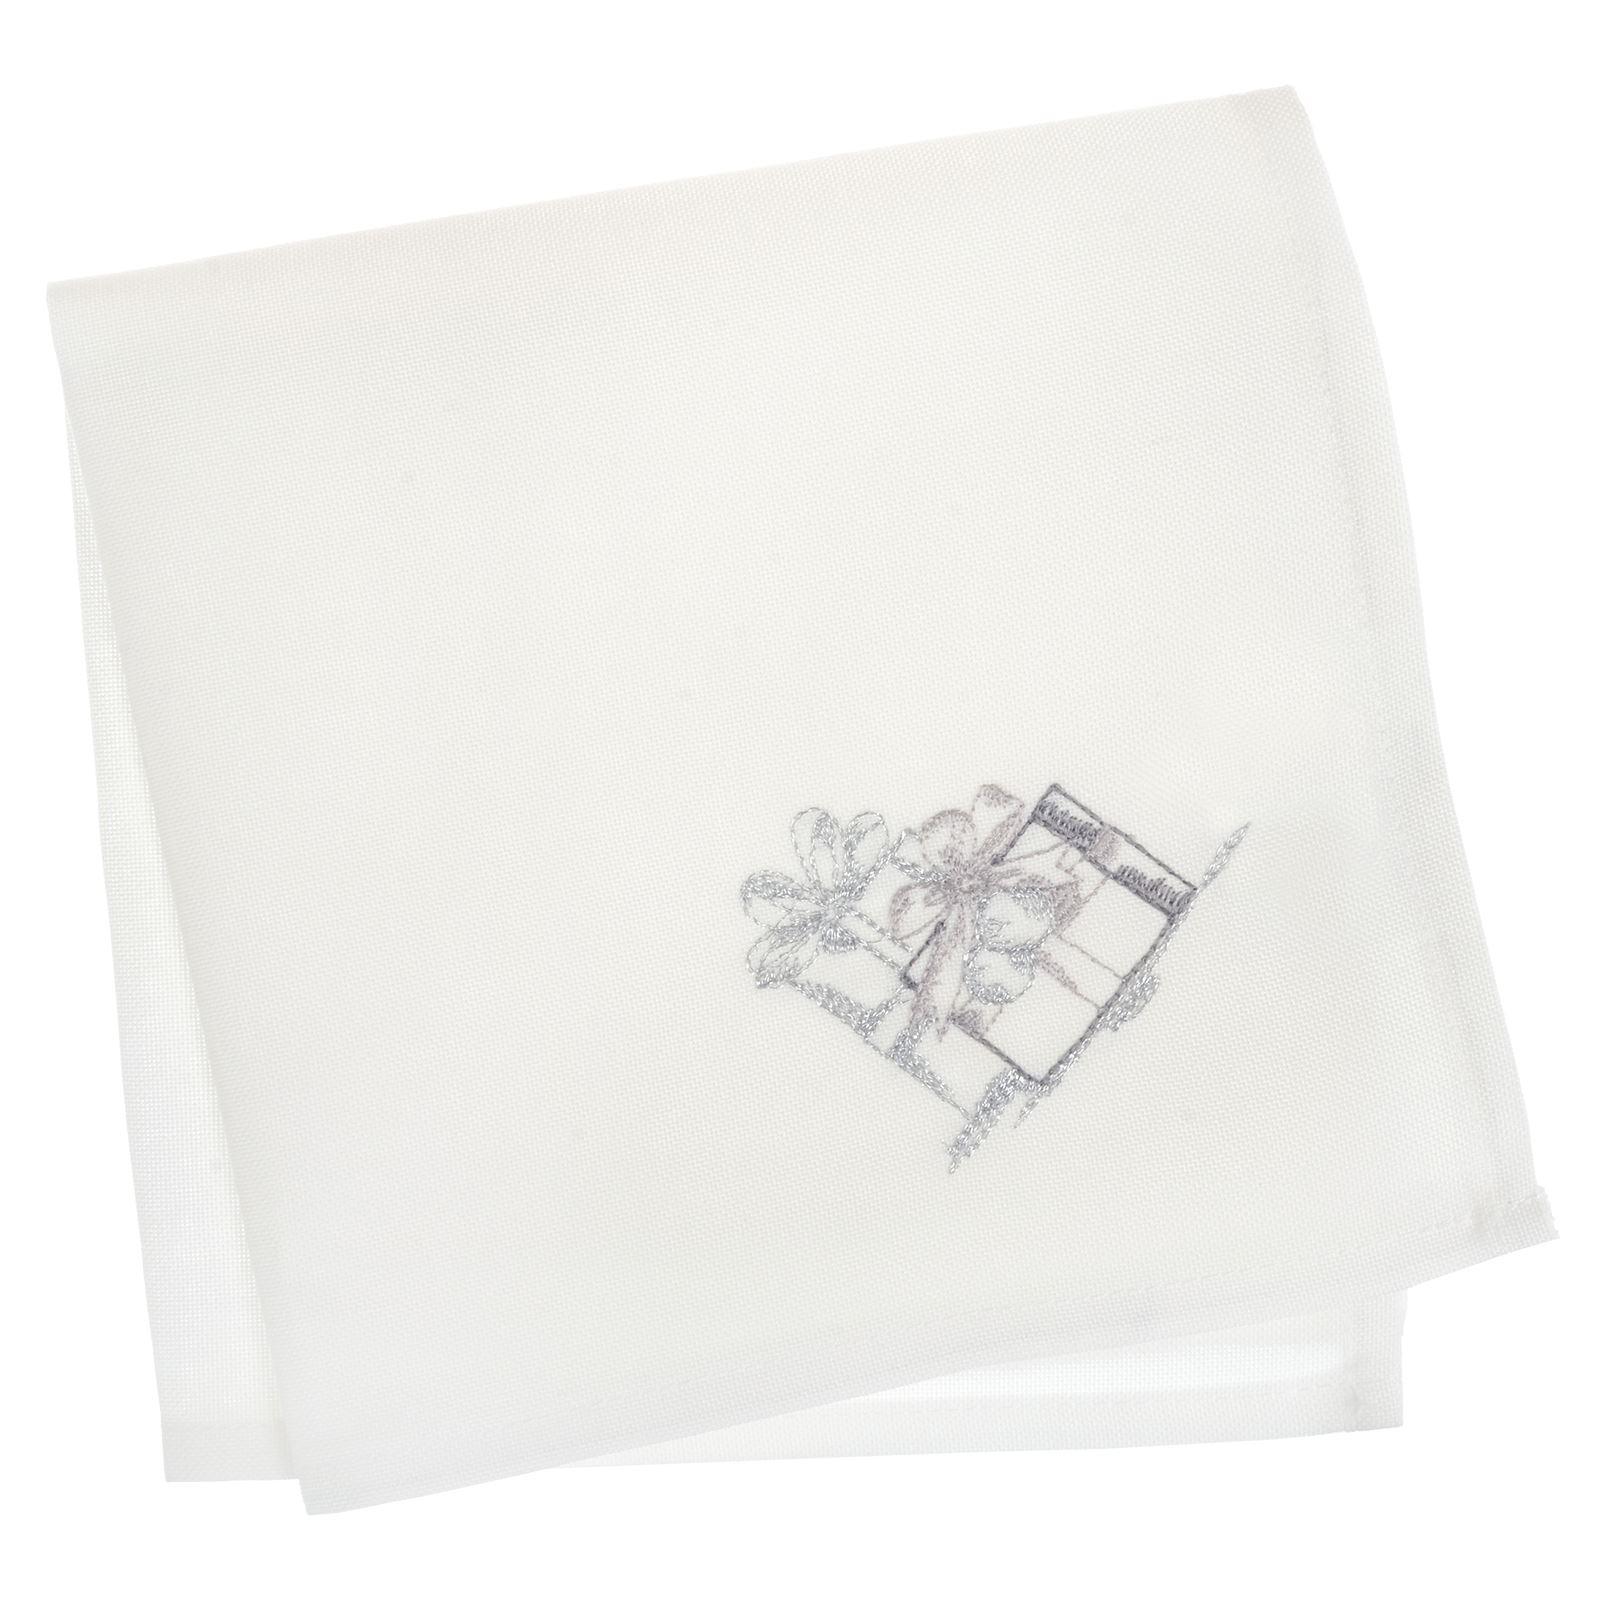 Christmas-Tablecloth-Festive-Pattern-Rectangle-Round-Fabric-Xmas-Room-Decoration Indexbild 151